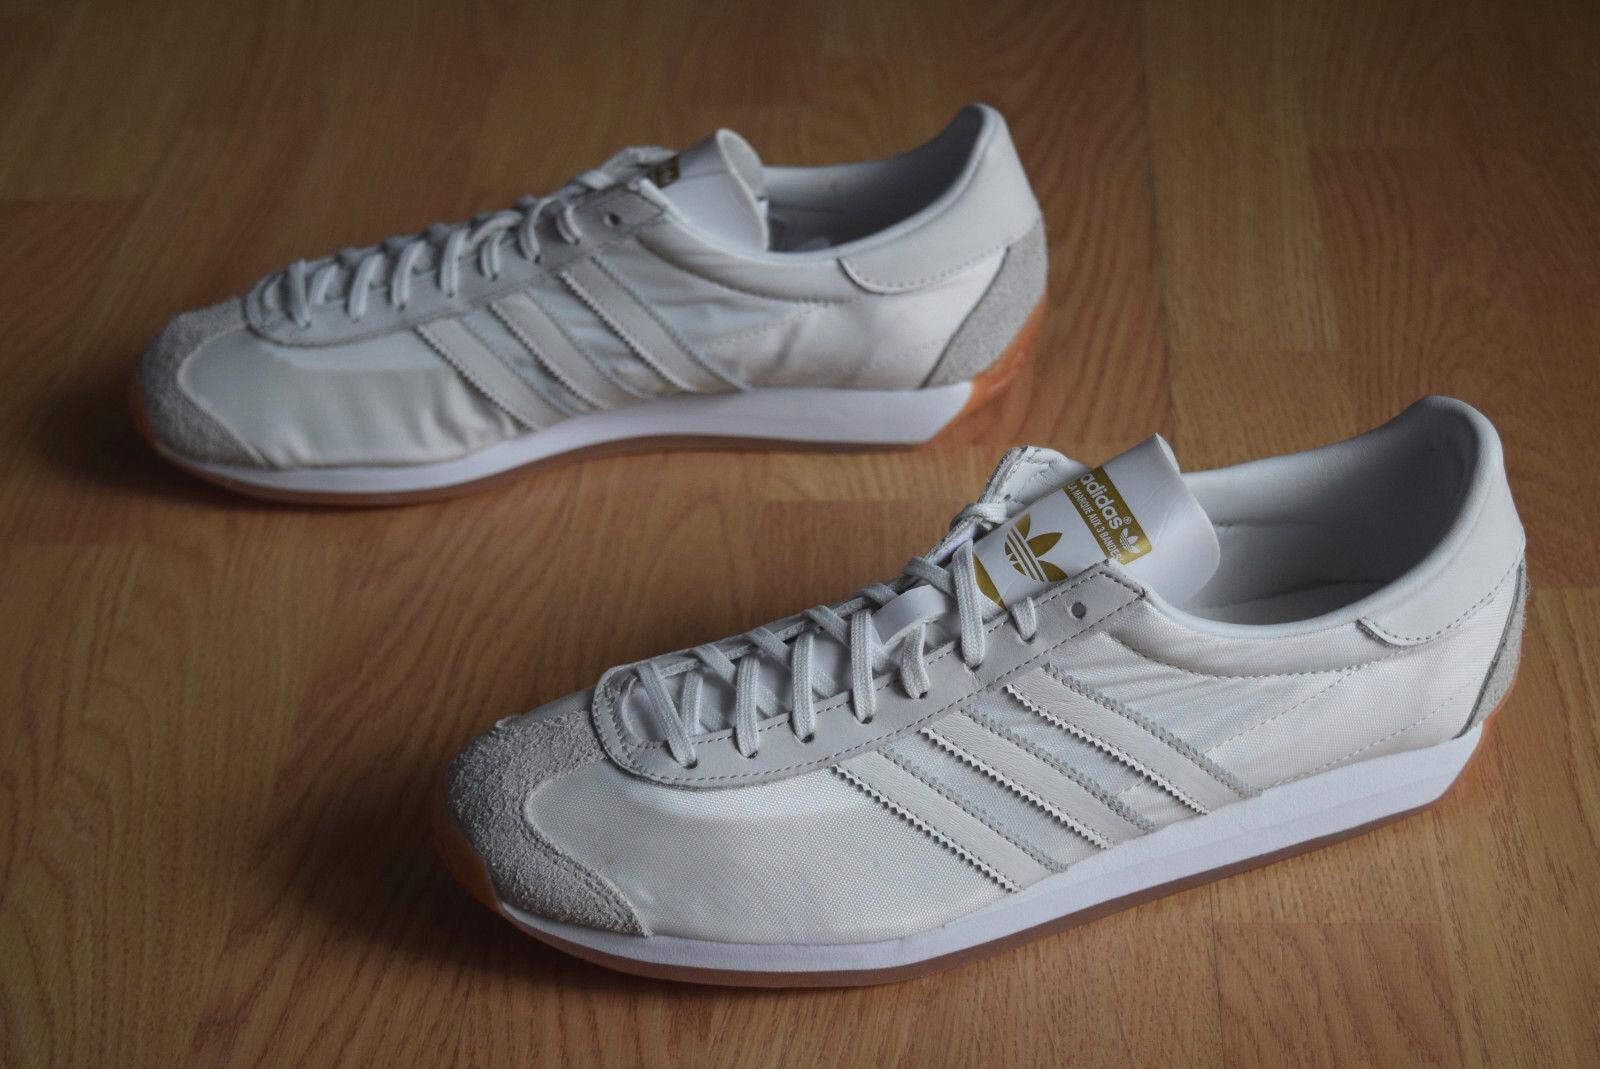 Adidas Country Og 42,5 43 44 44,5 Trainer 45 46 48,5 S32105 Vintage Sl la Trainer 44,5 Roma f85569